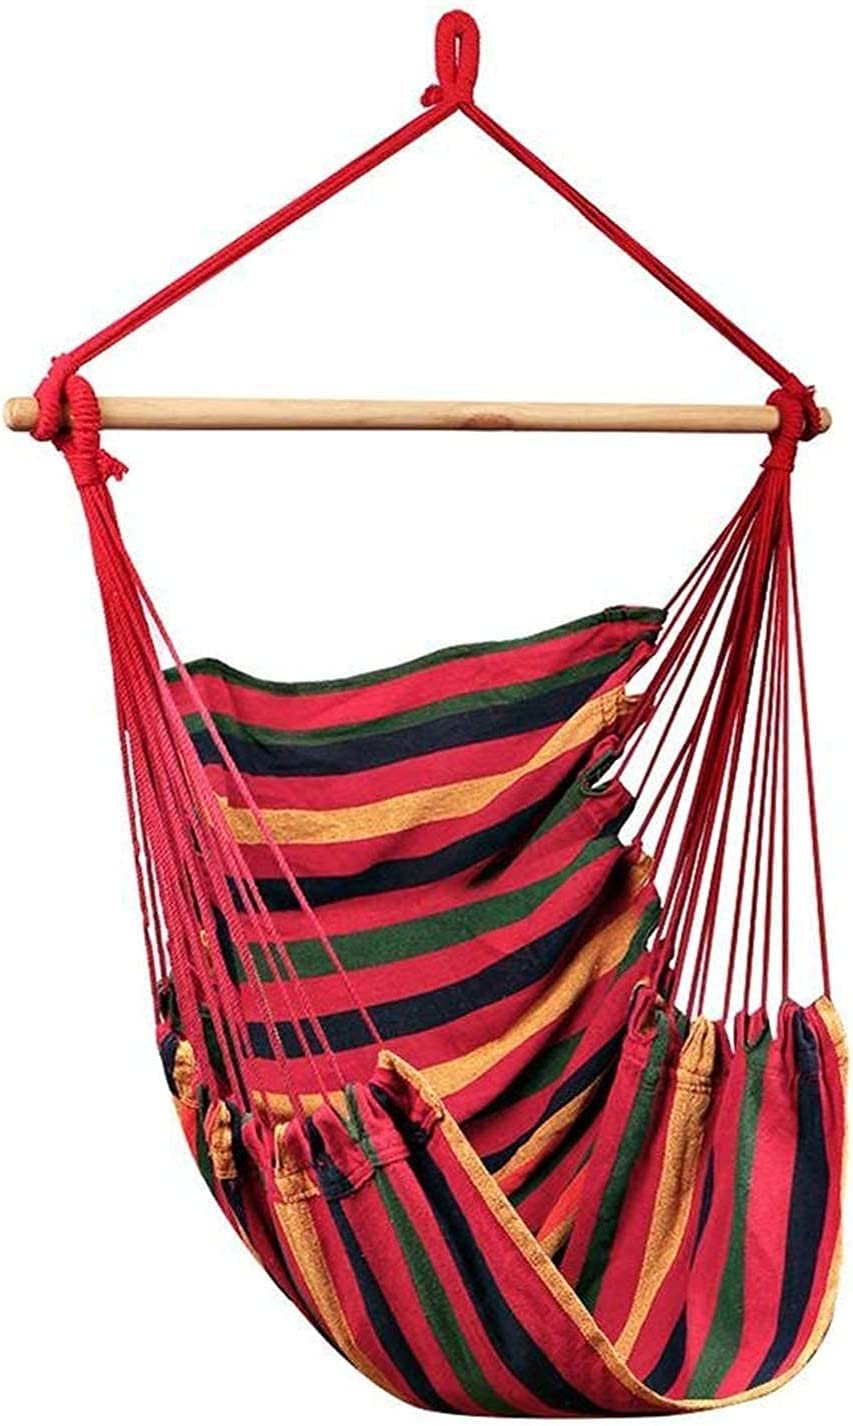 RVTYR Portable Travel Camping Seasonal Wrap Introduction Gear Rope Sw Dallas Mall Chair Hammock Hanging